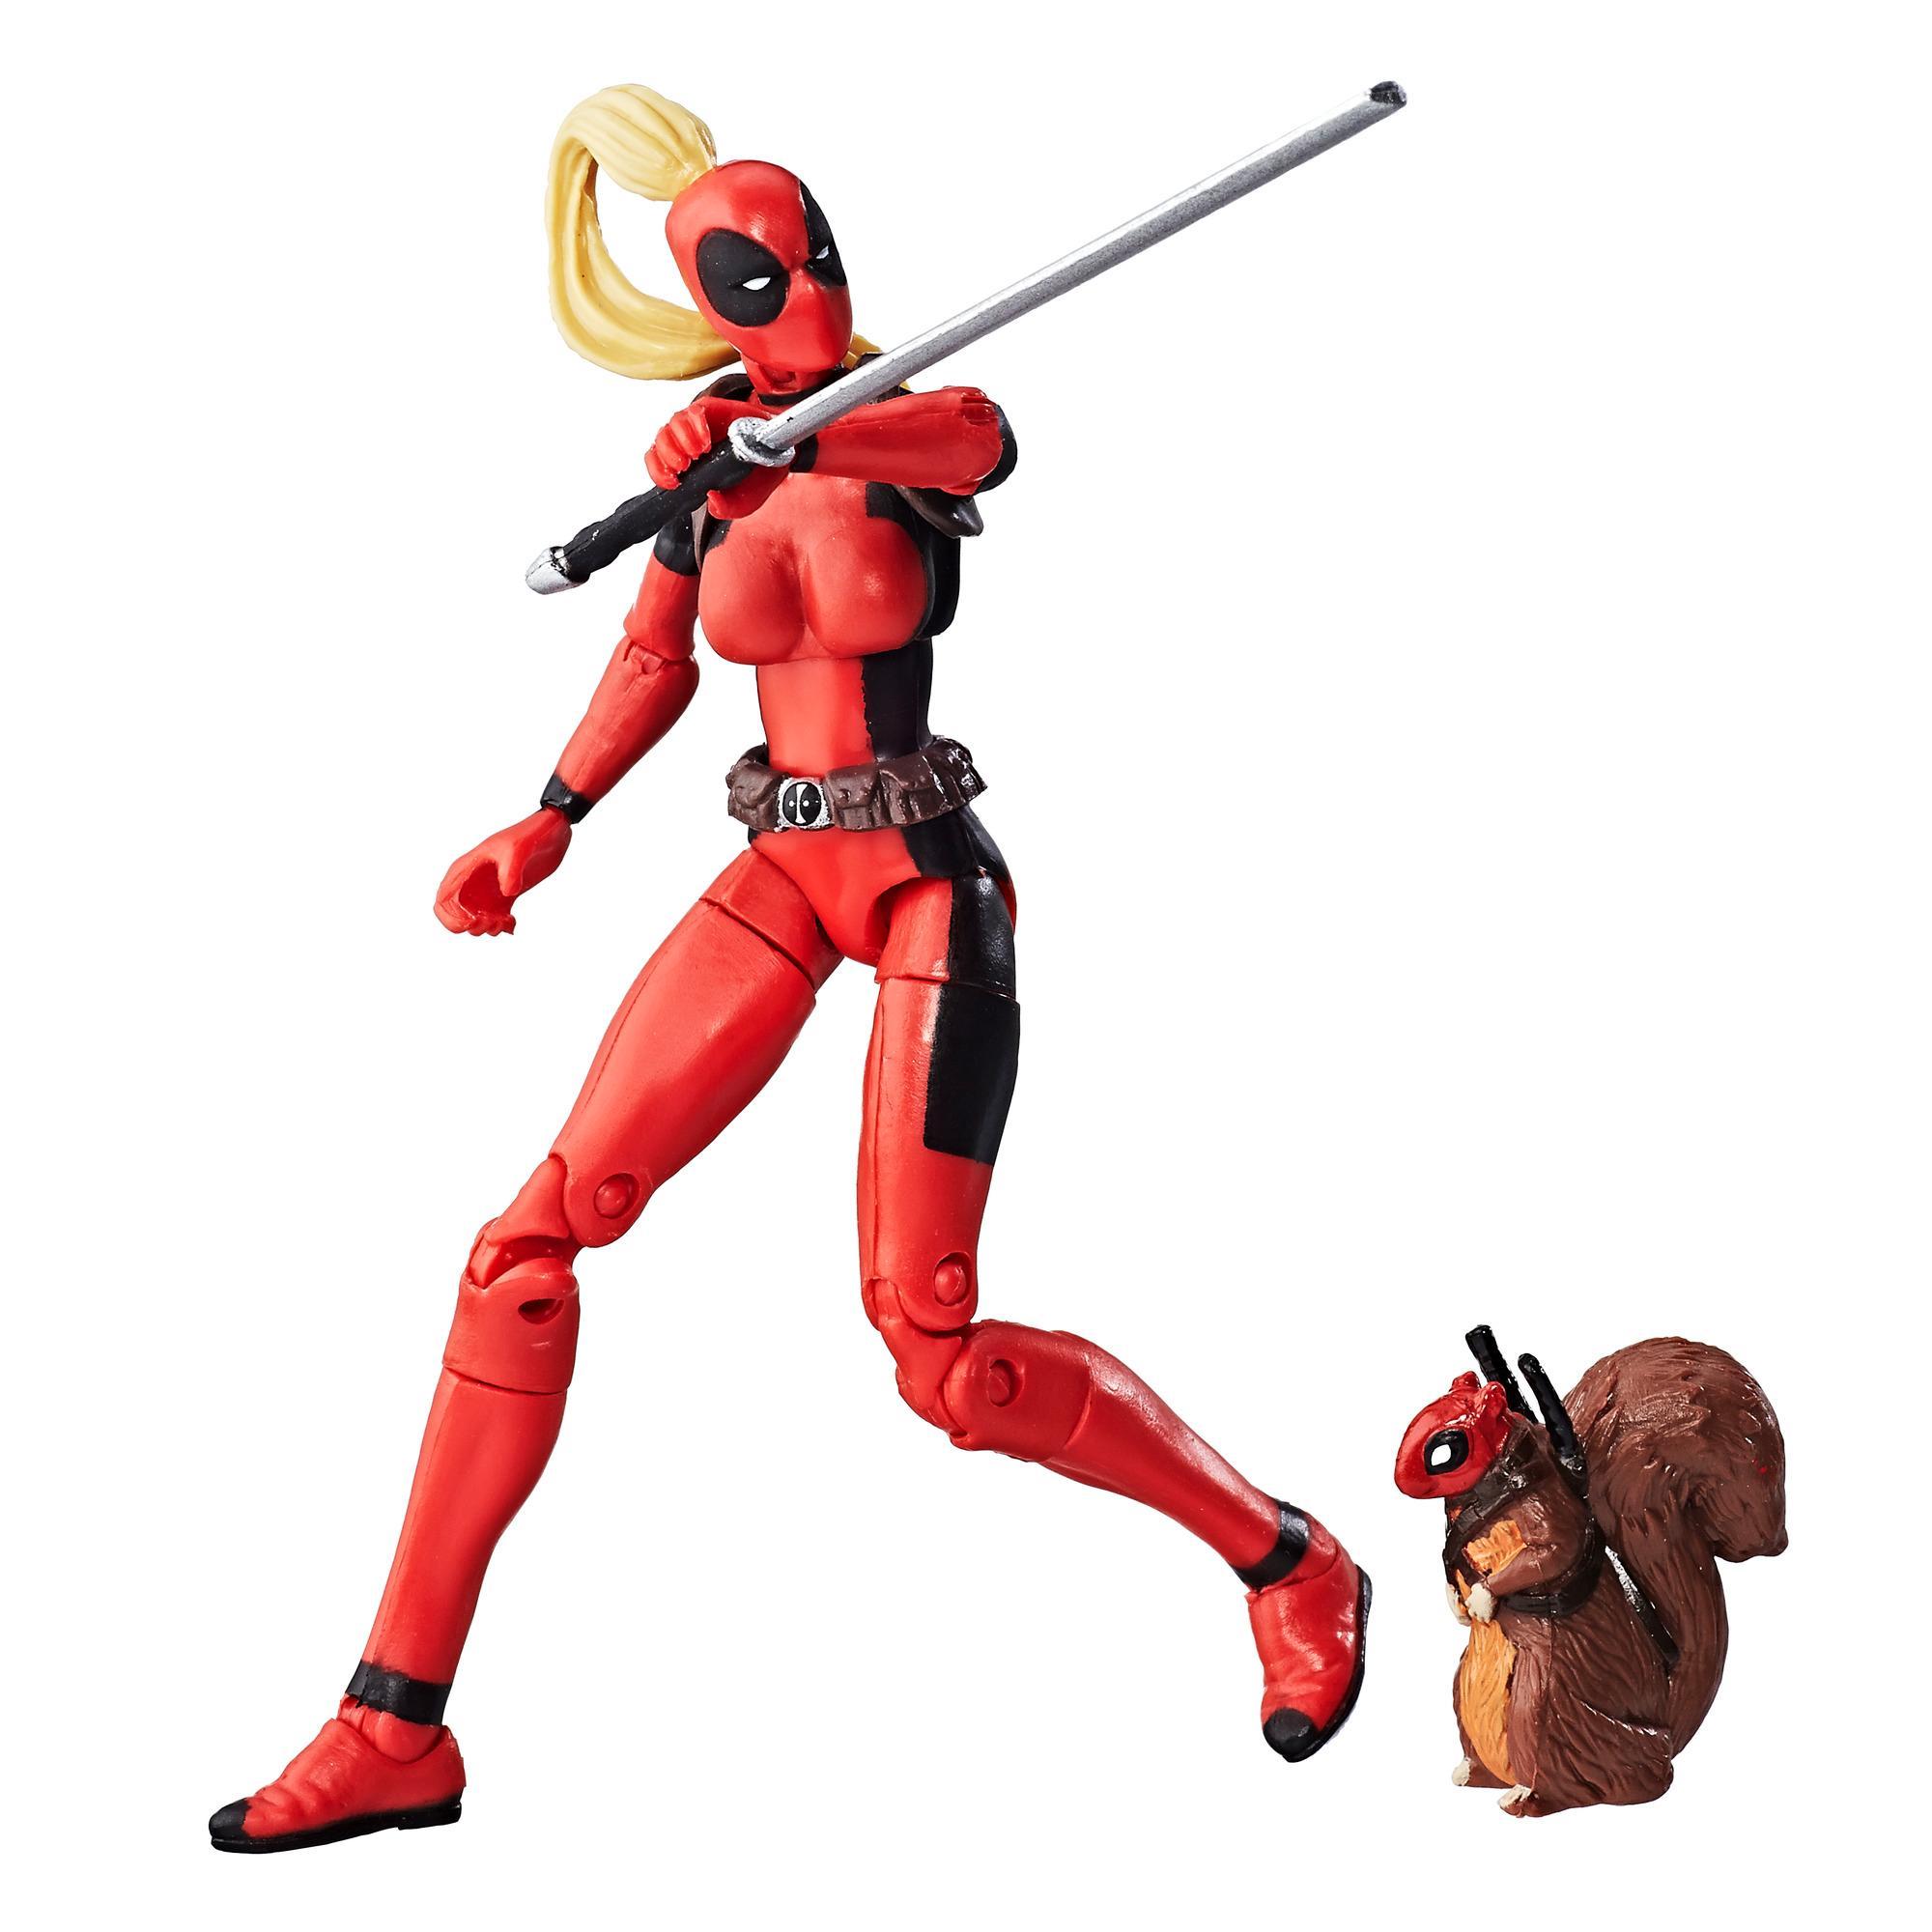 Коллекционная фигурка Мстителей Леди Дедпул 9,5 см.